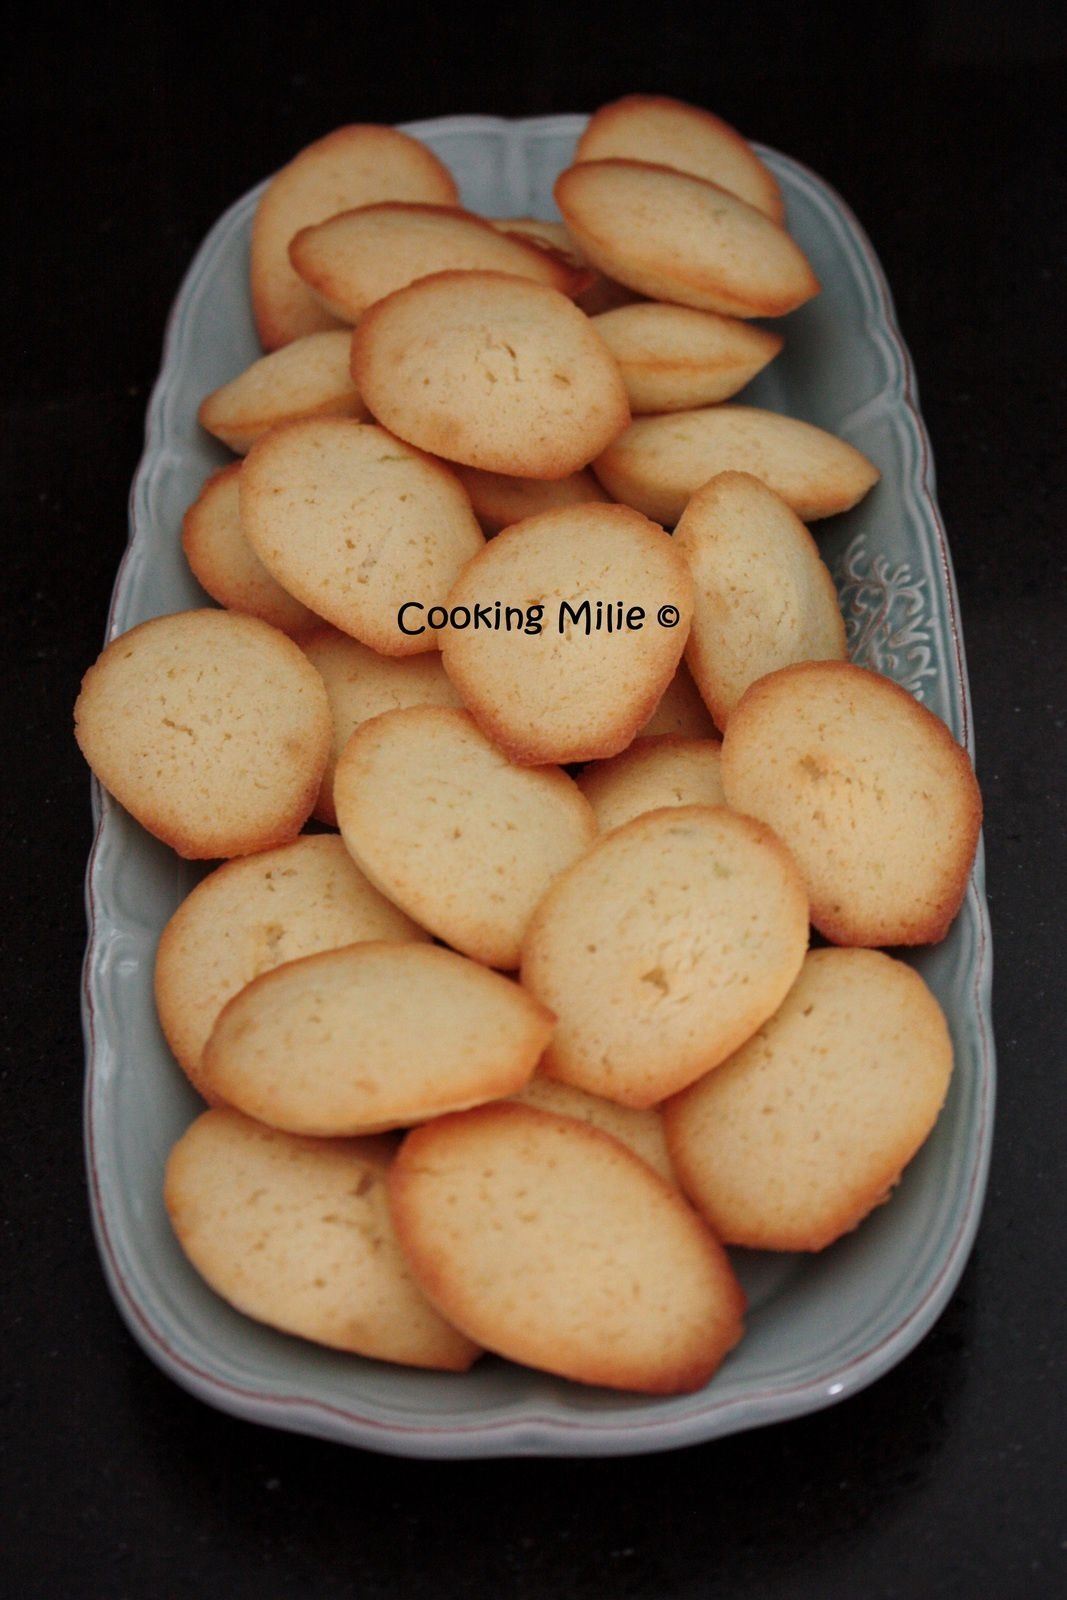 Petites madeleines au citron vert